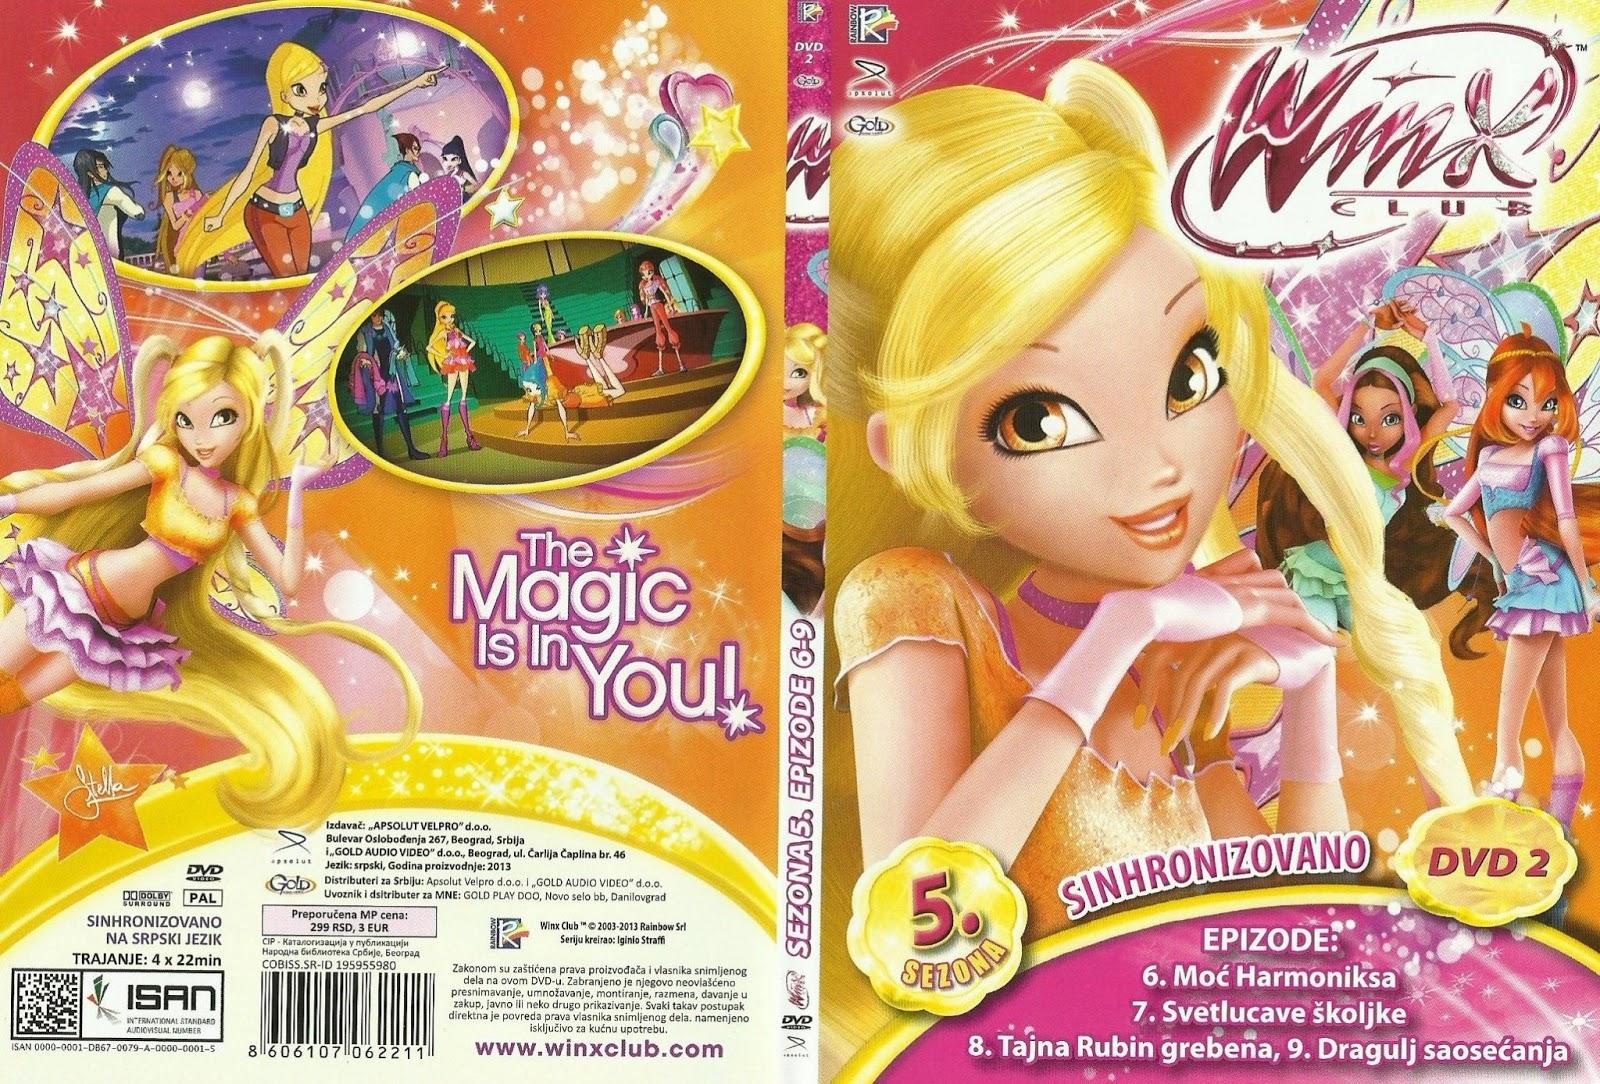 WinxClub4Ever | News™: NEW IN SERBIA! WINX DVD No.2 ! Novi ...